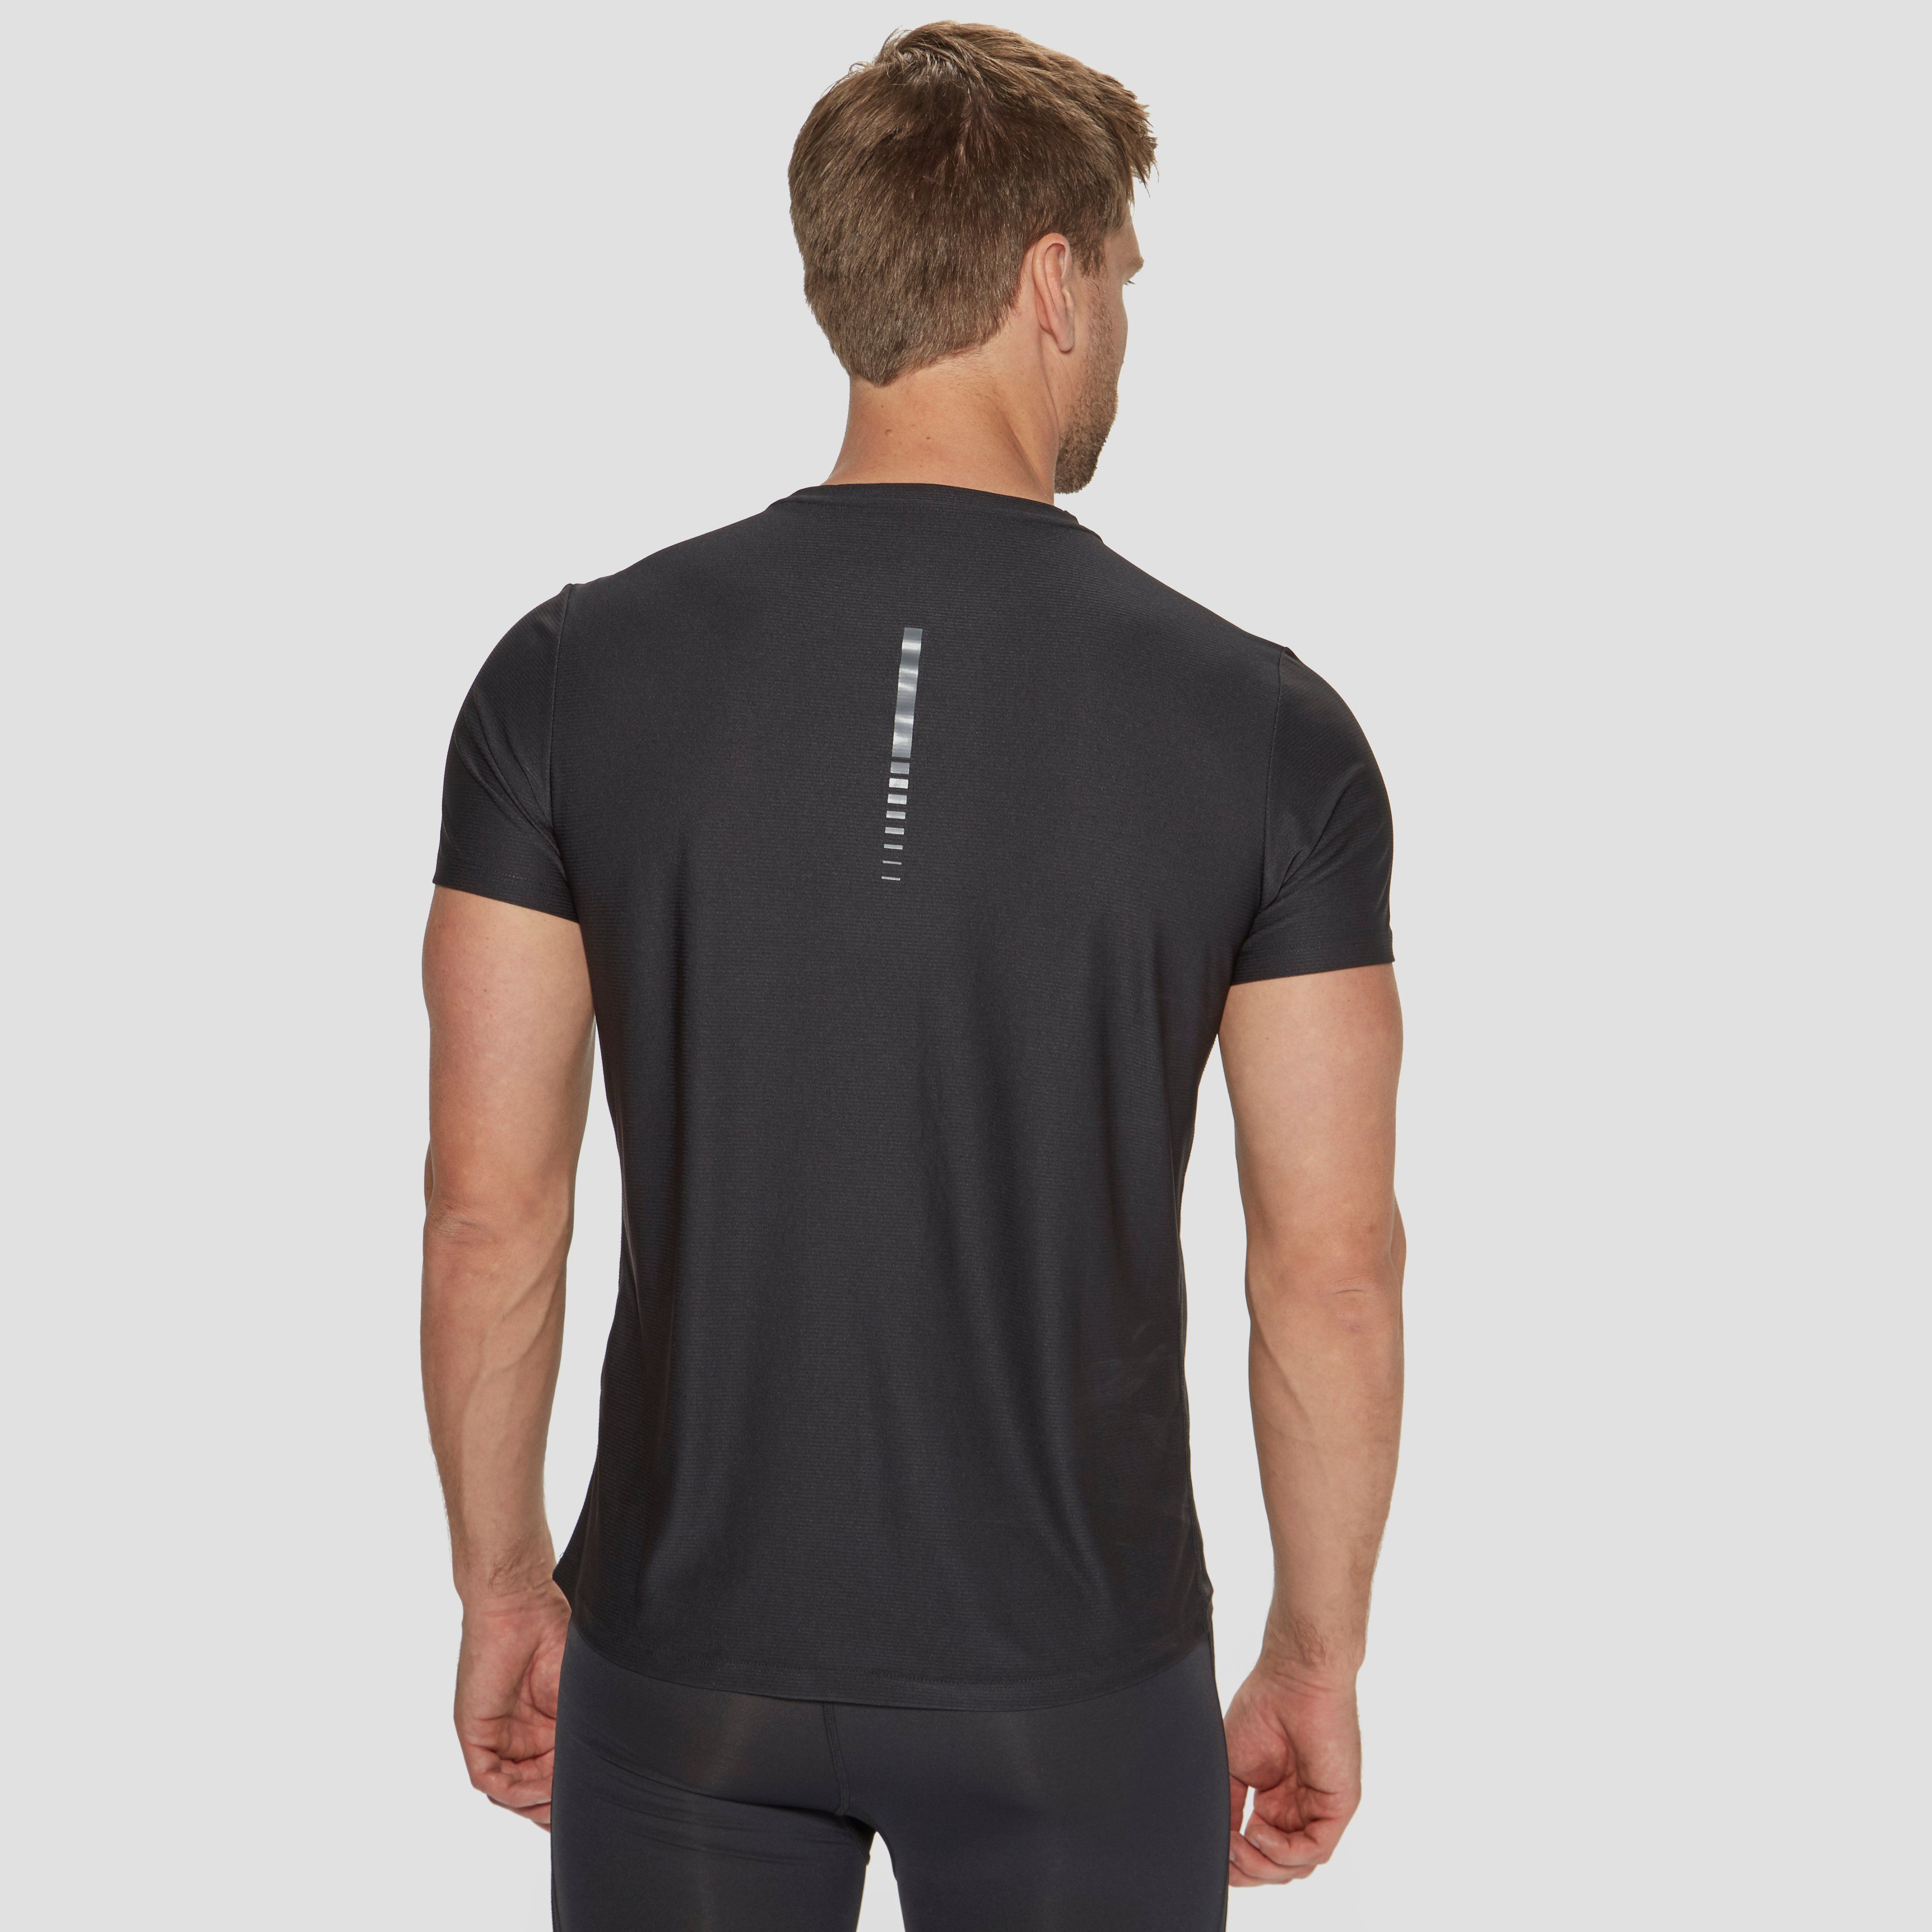 ASICS Men's SS T-Shirt